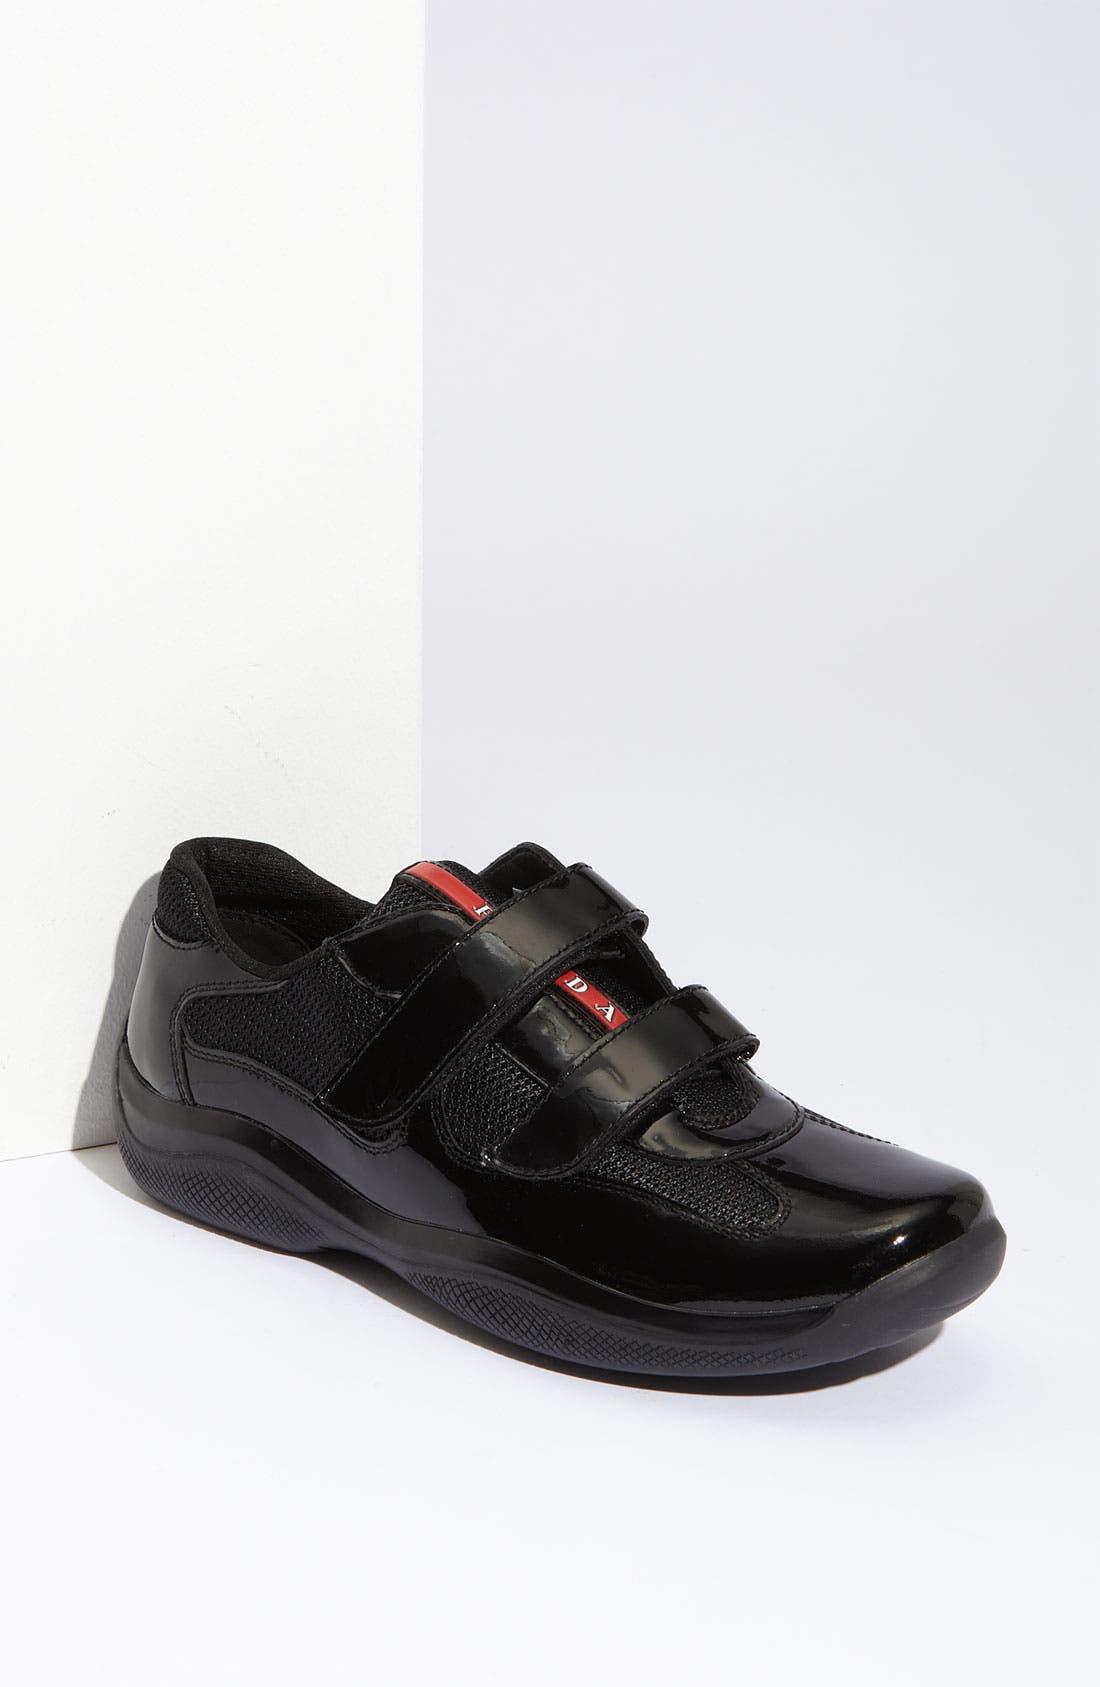 Alternate Image 1 Selected - Prada 'America's Cup' Patent Leather Sneaker